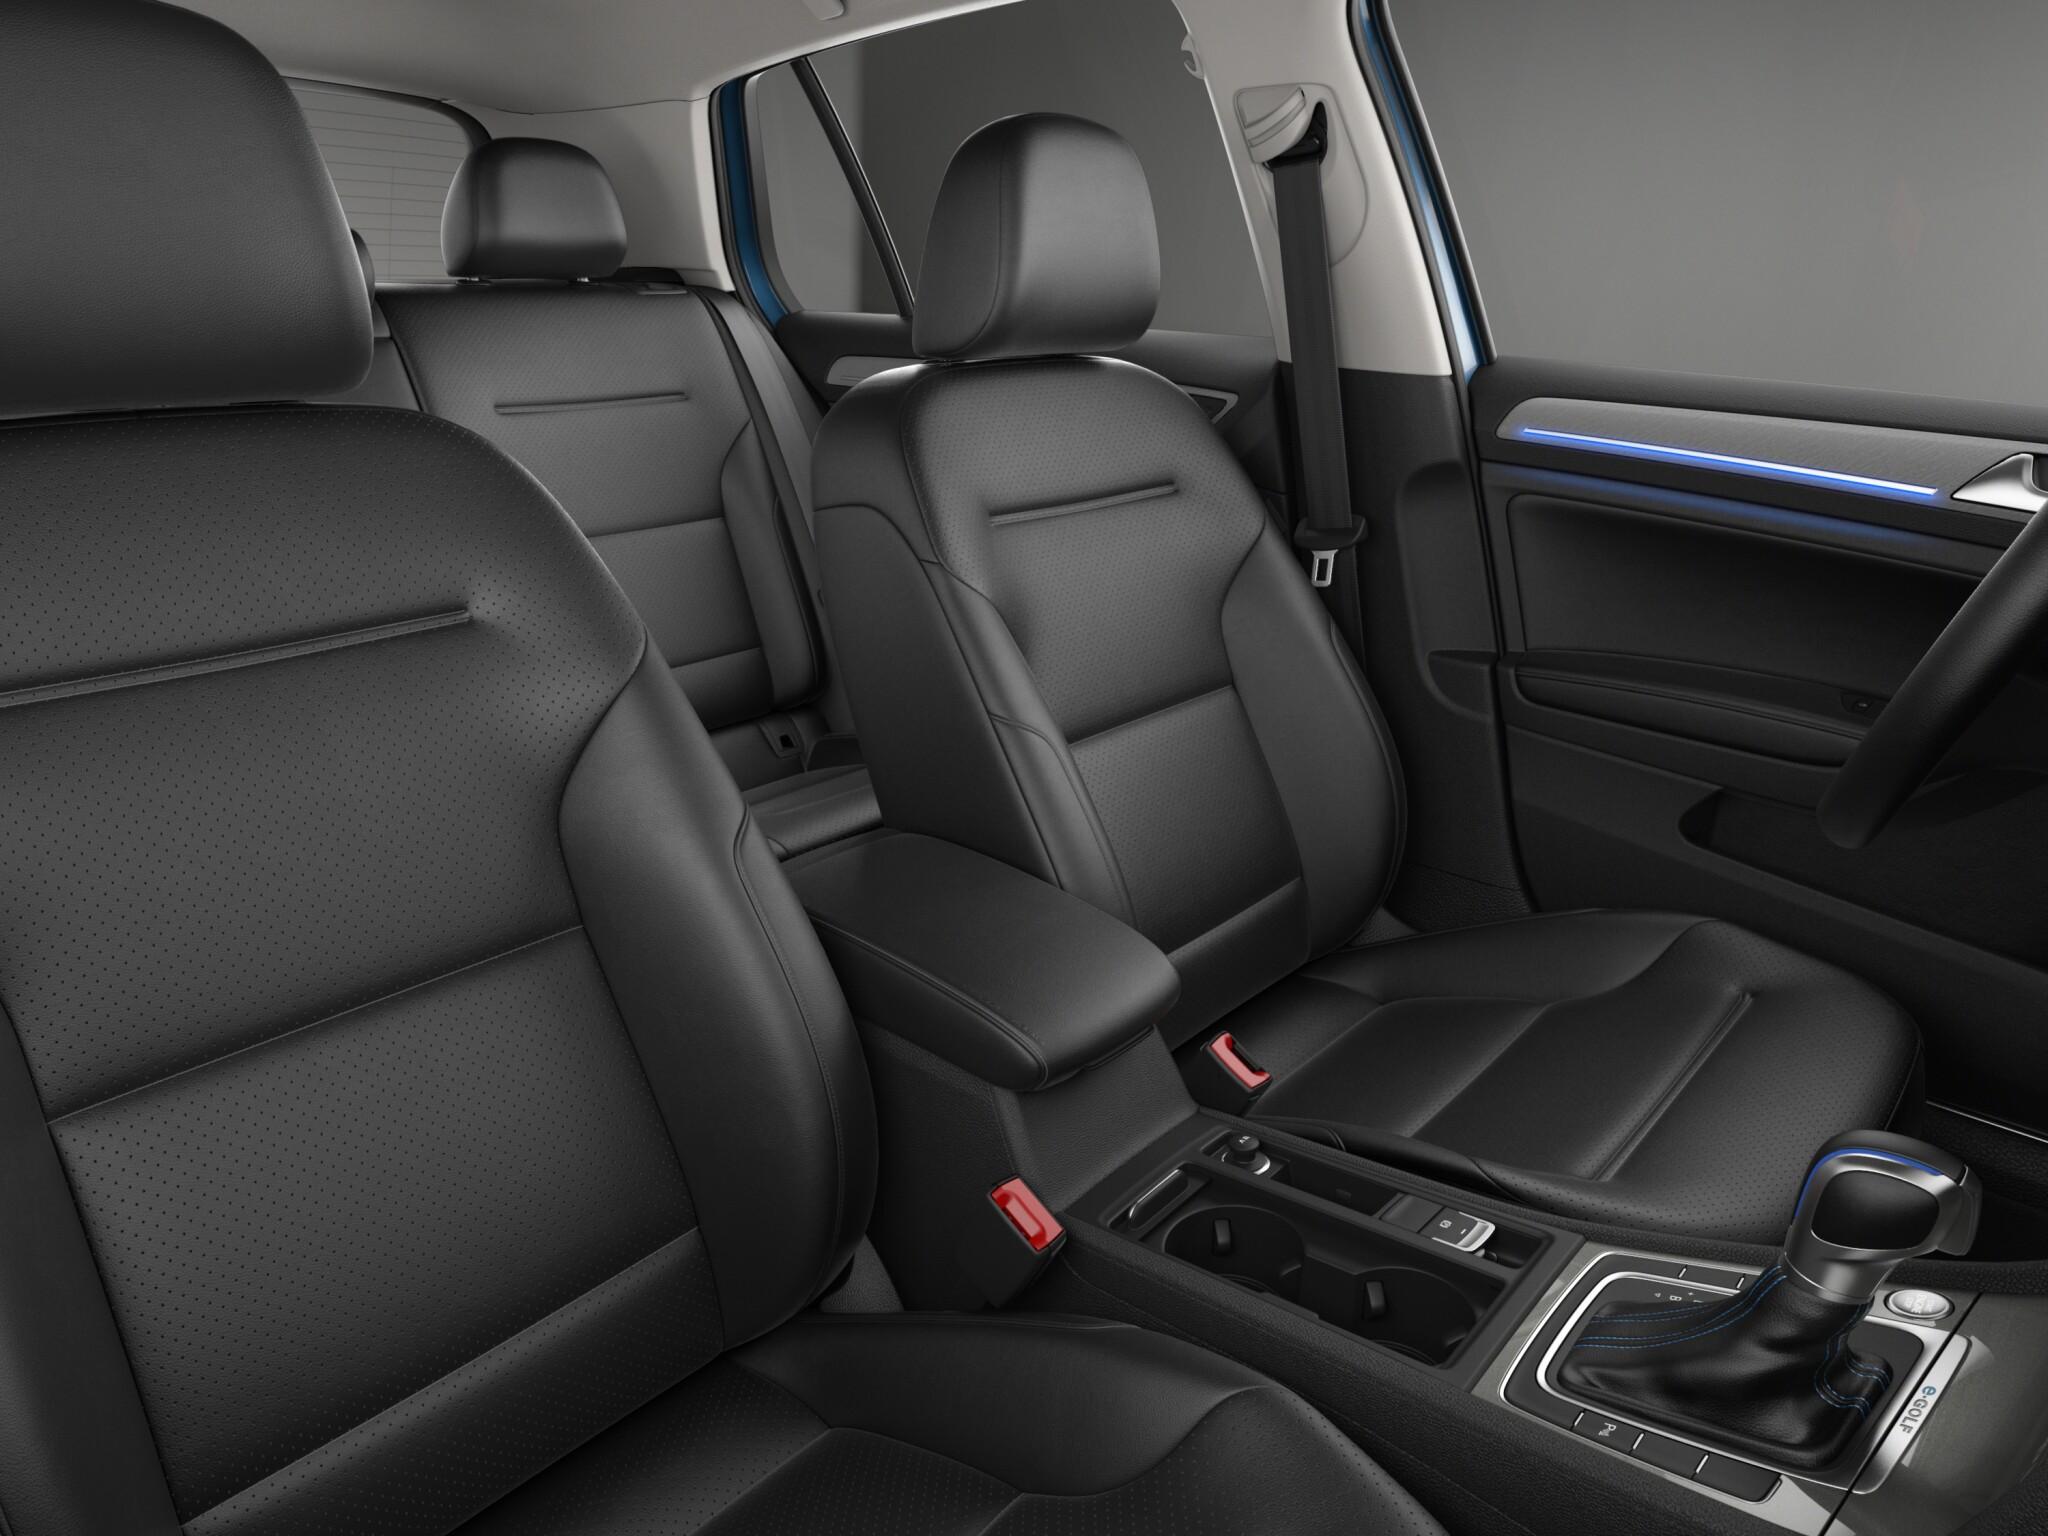 2016 Volkswagen e-Golf Front Seats Interior